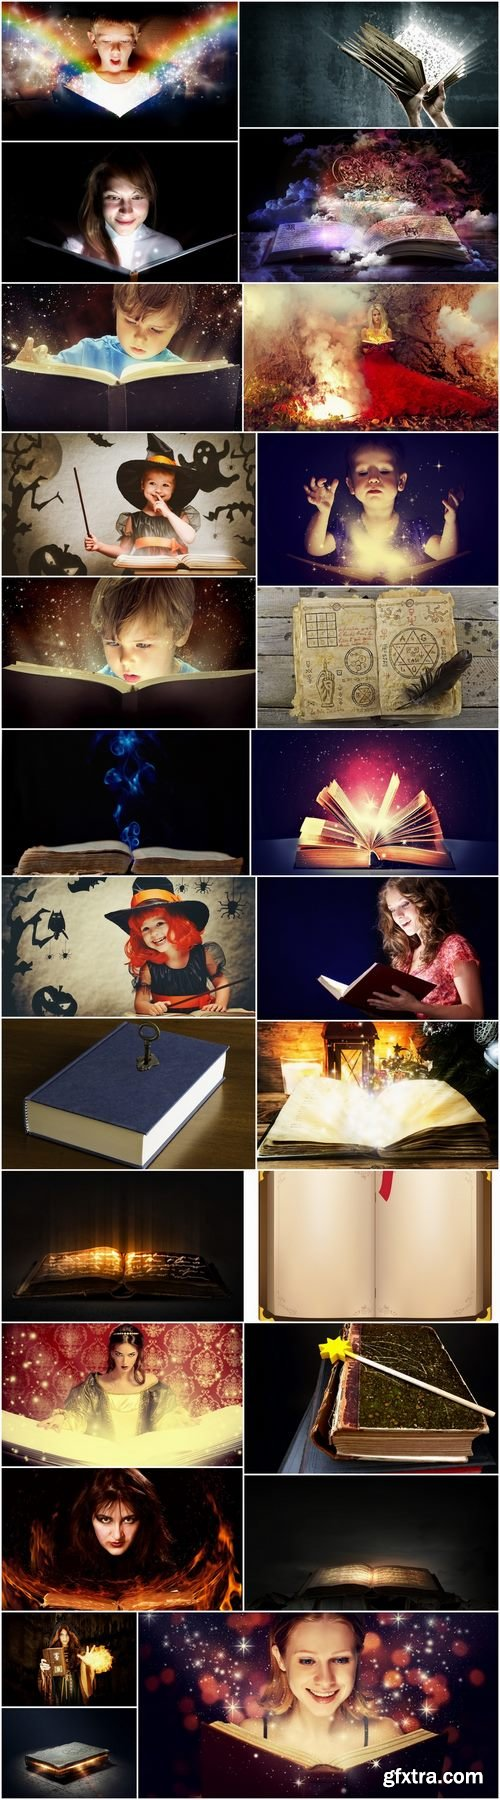 Magical magic wizardry book 25 HQ Jpeg